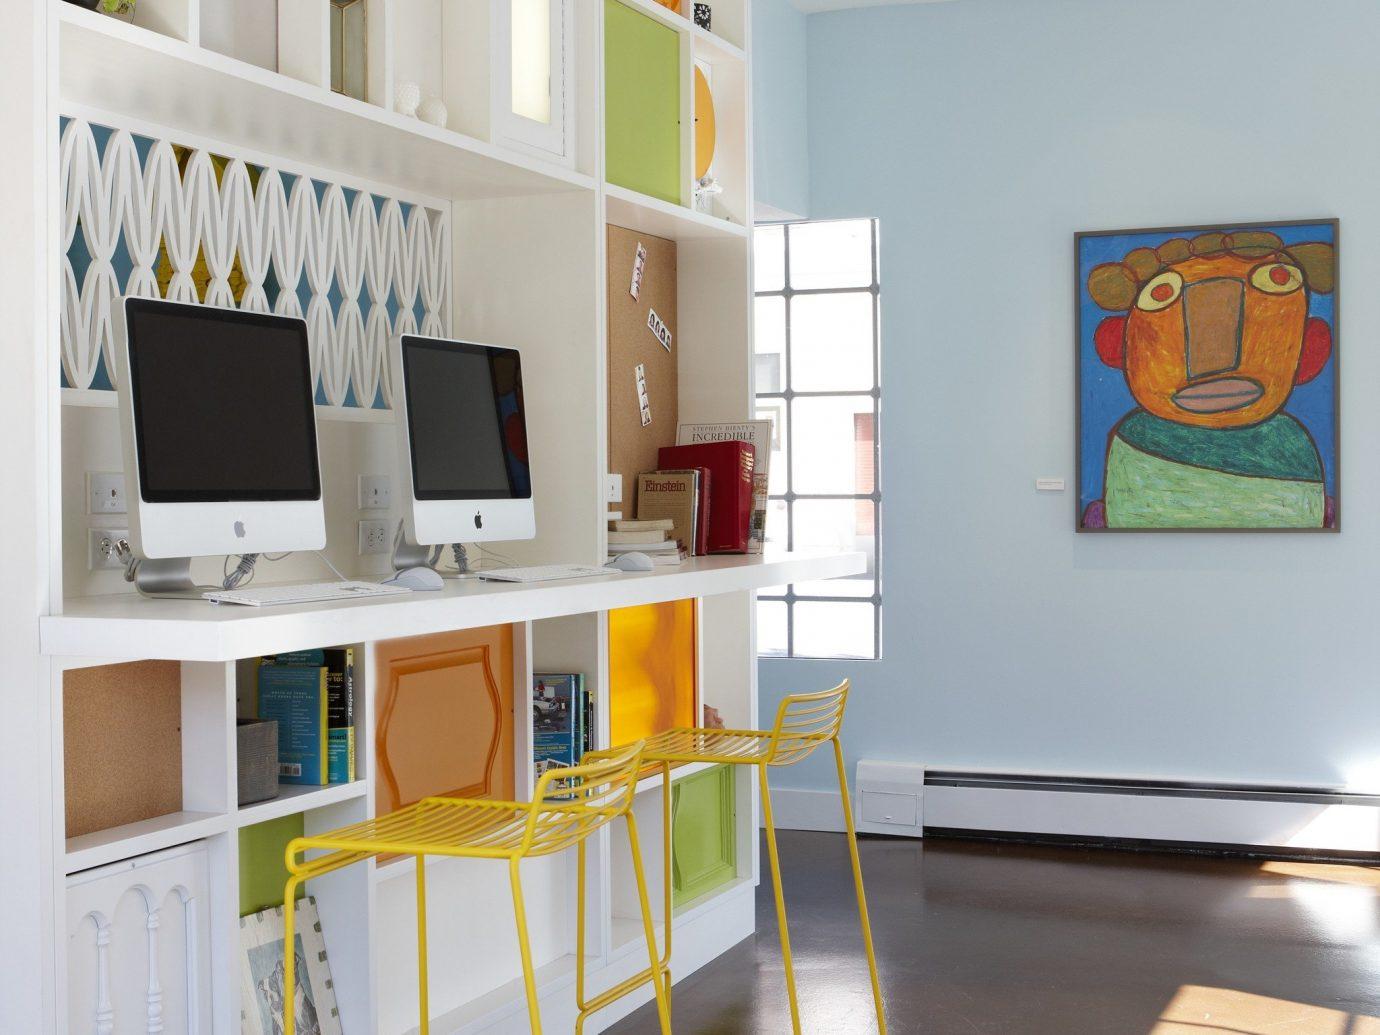 Hotels indoor floor wall room property home interior design real estate furniture living room Design